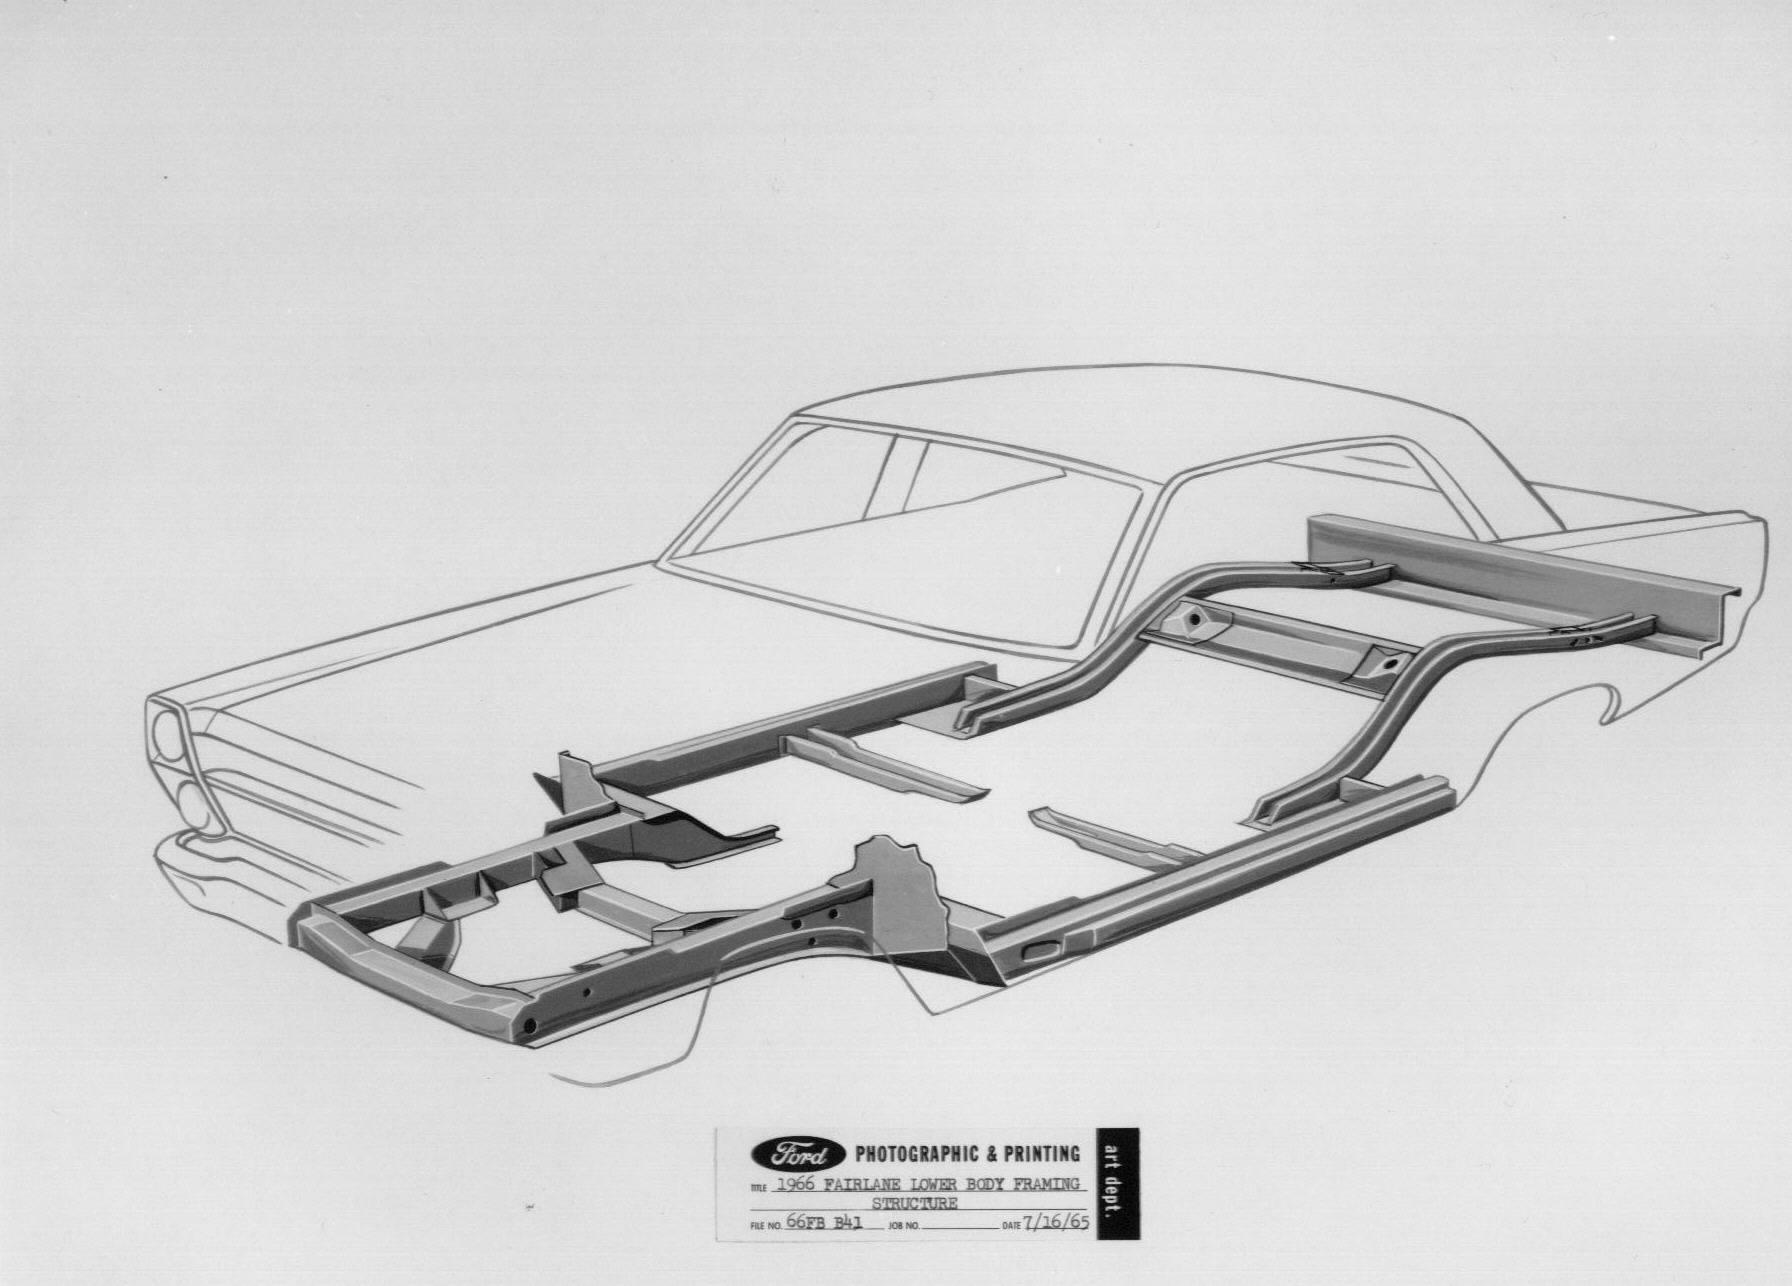 1966 fairlane convertible